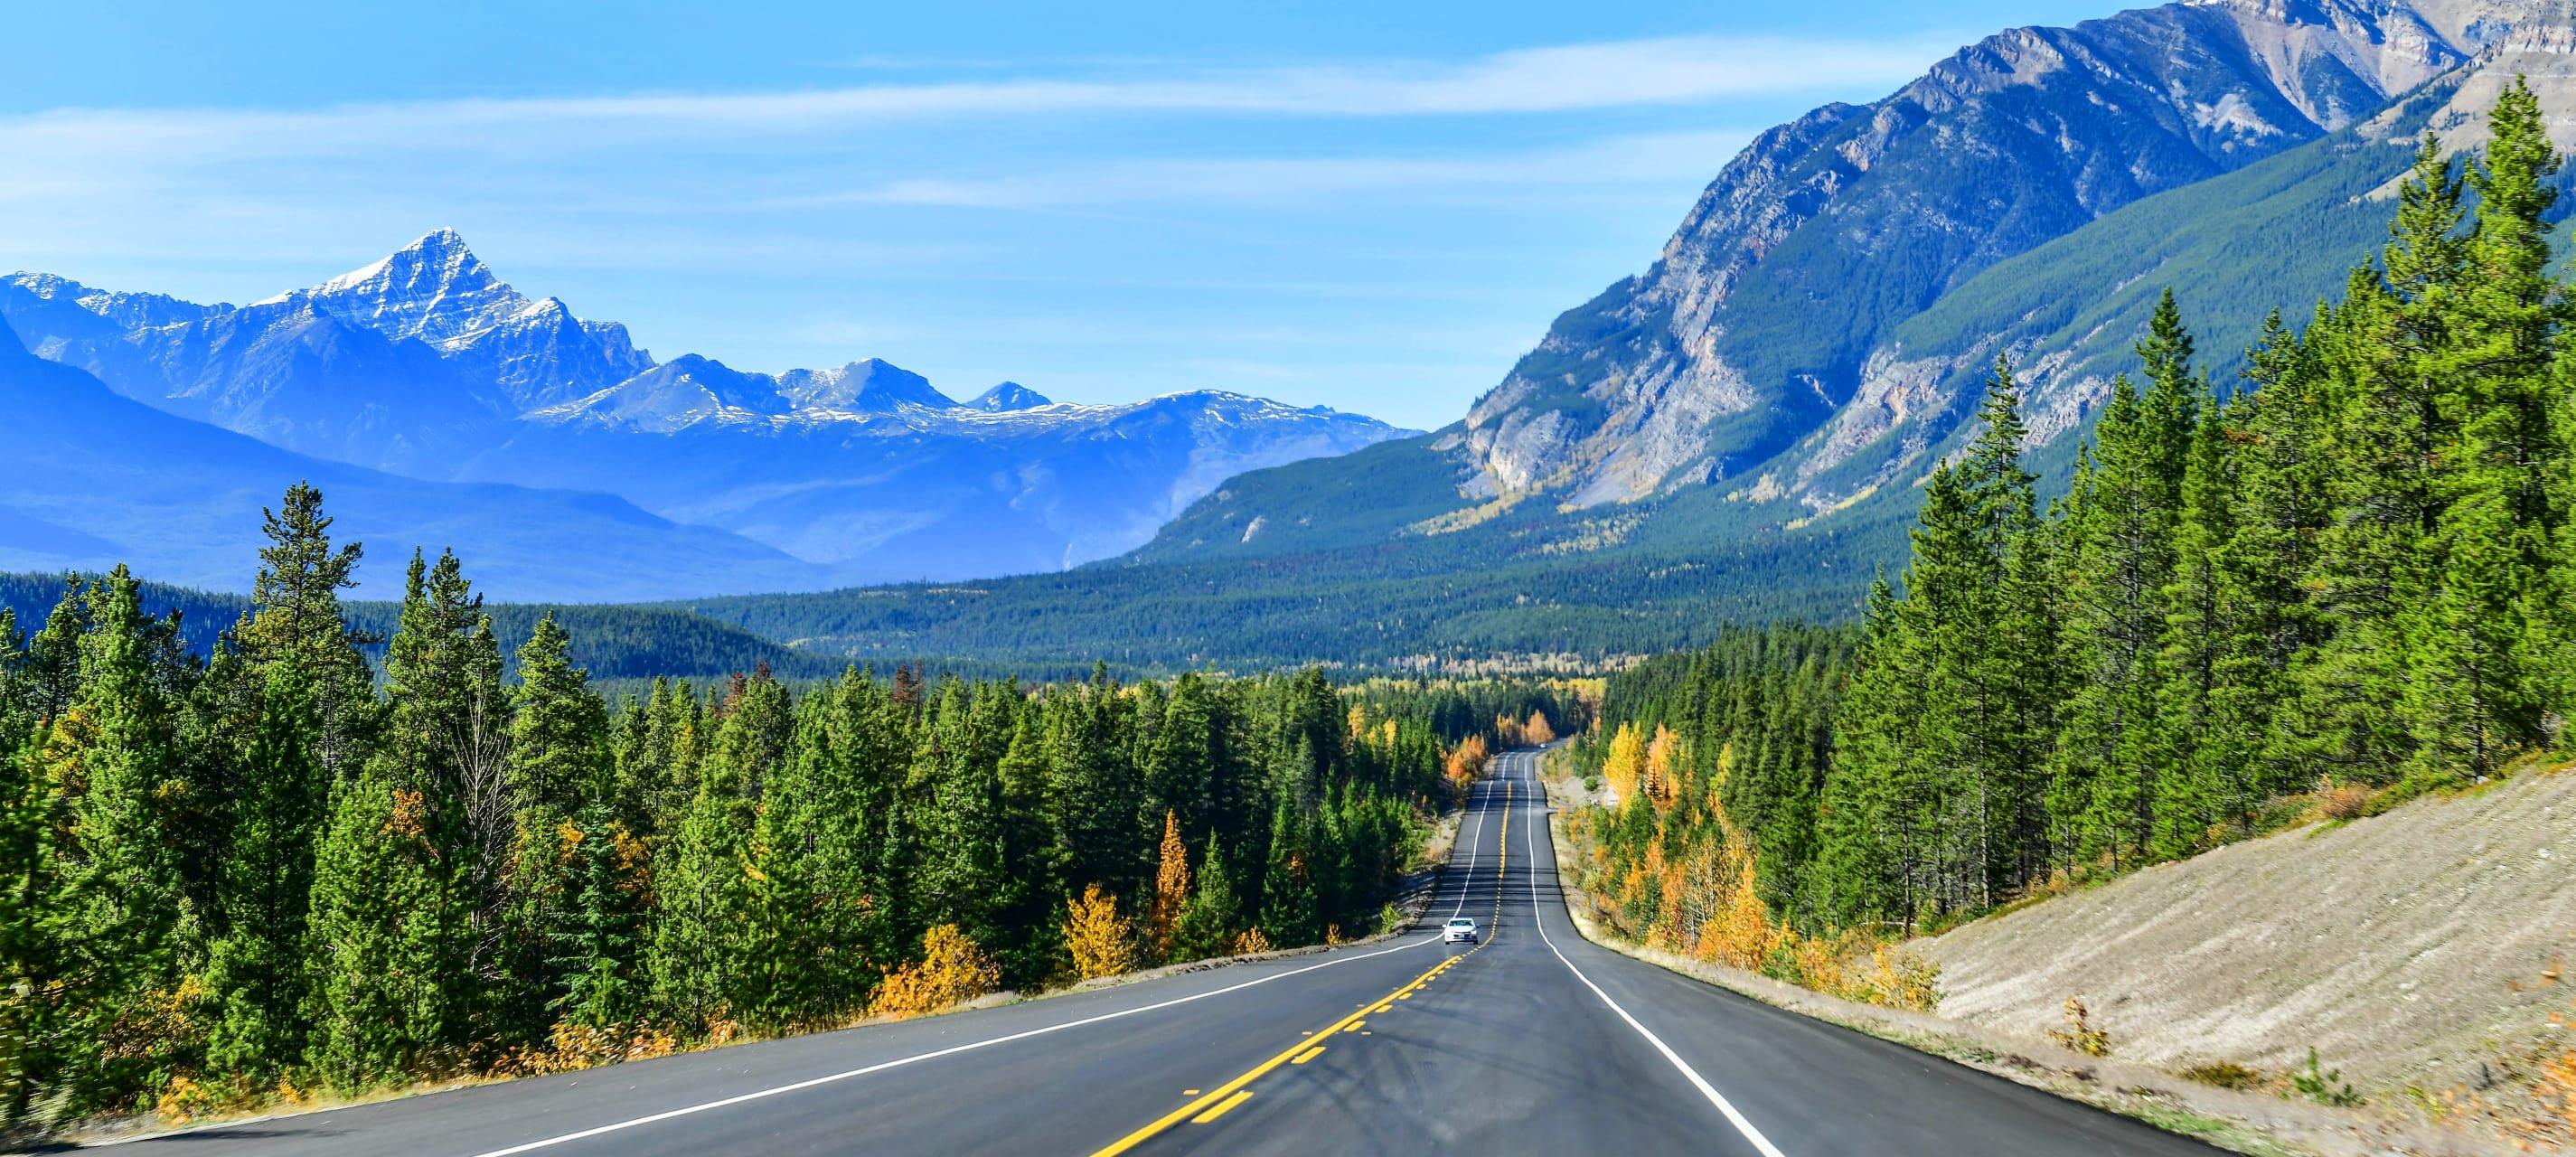 Central Canada Road-Trip